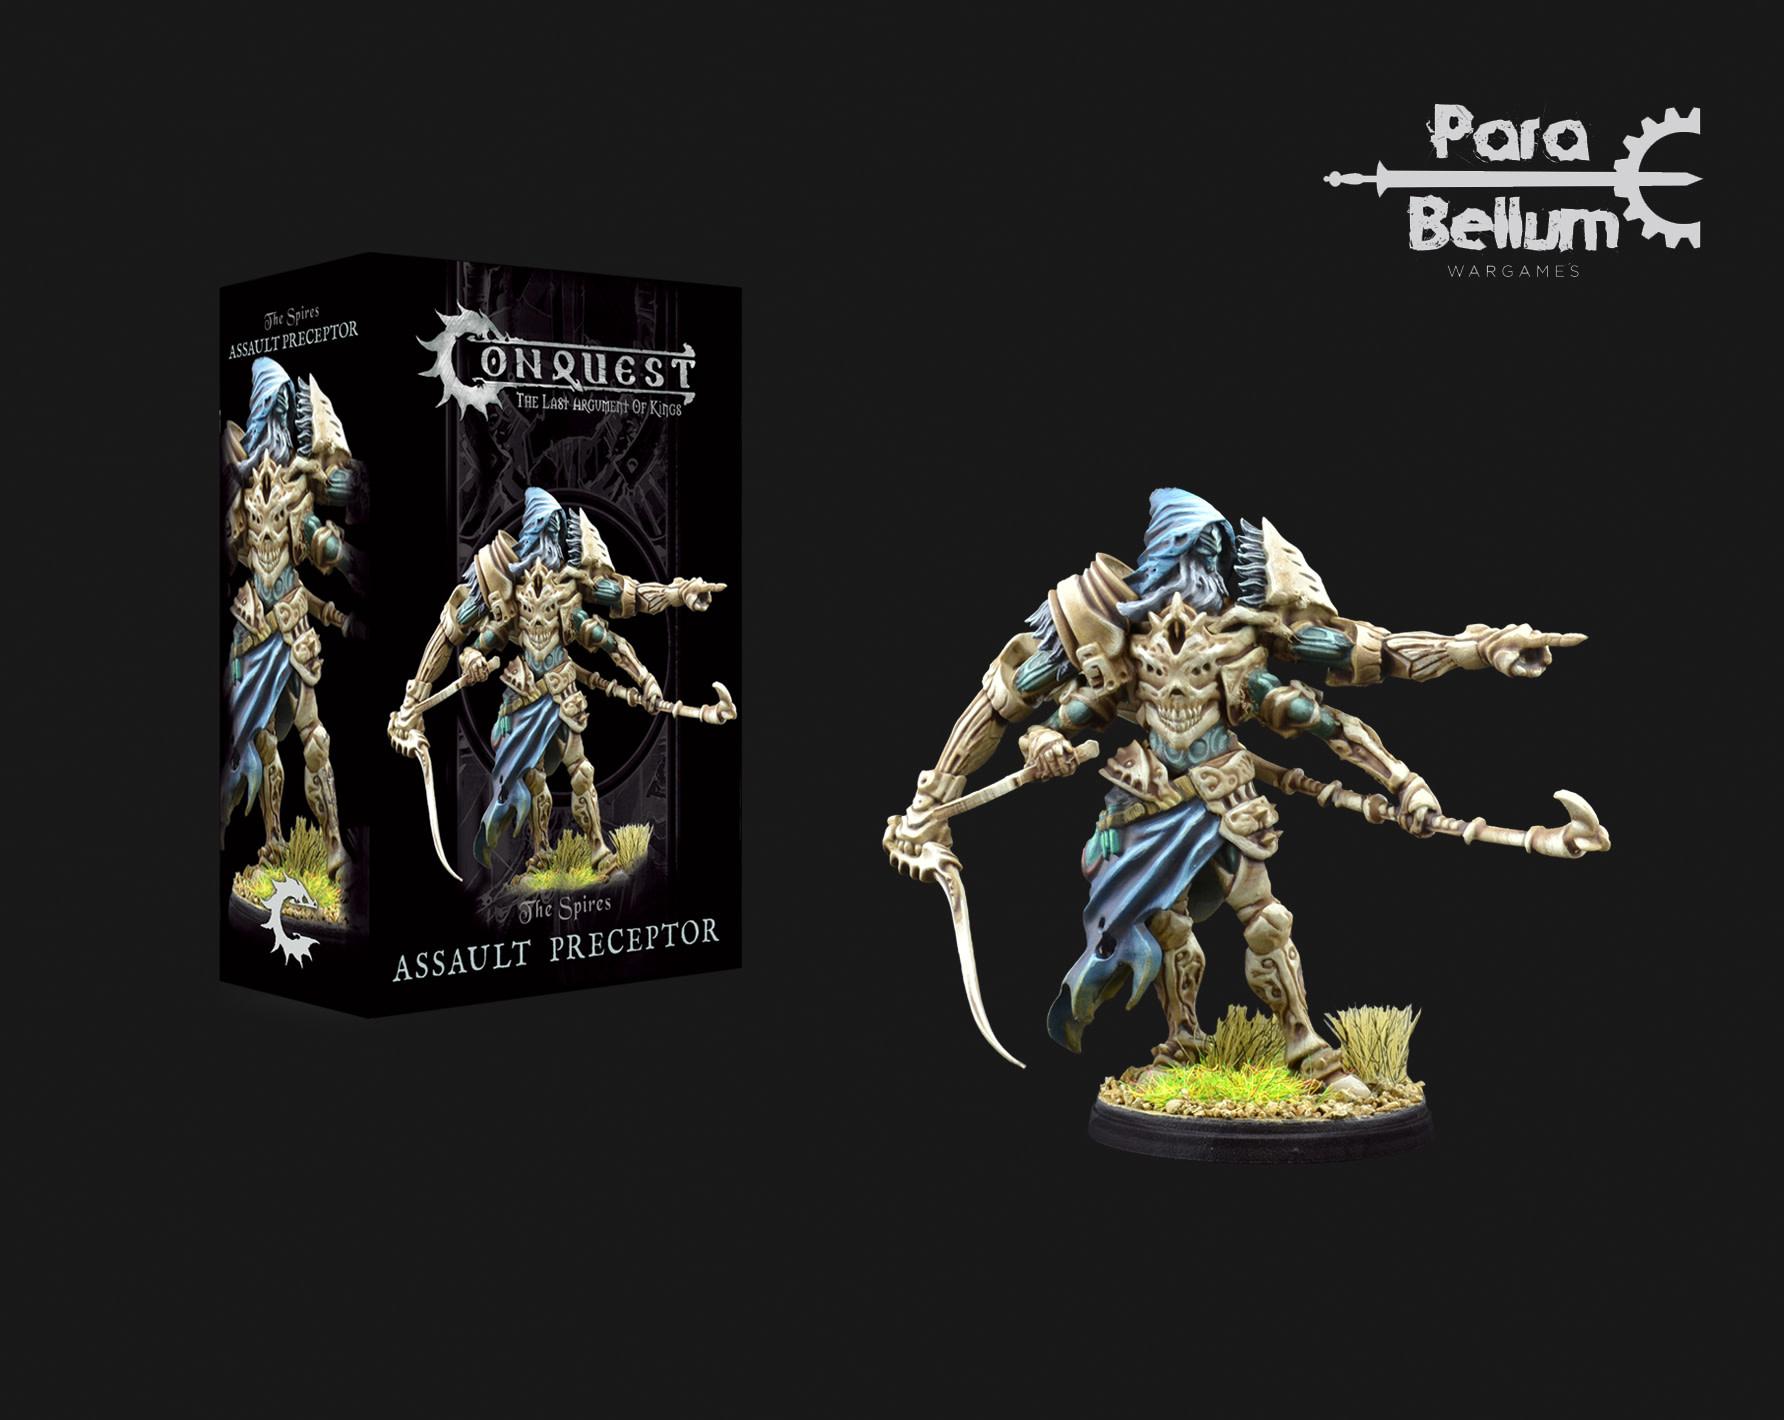 Para Bellum Spires: Assault Preceptor